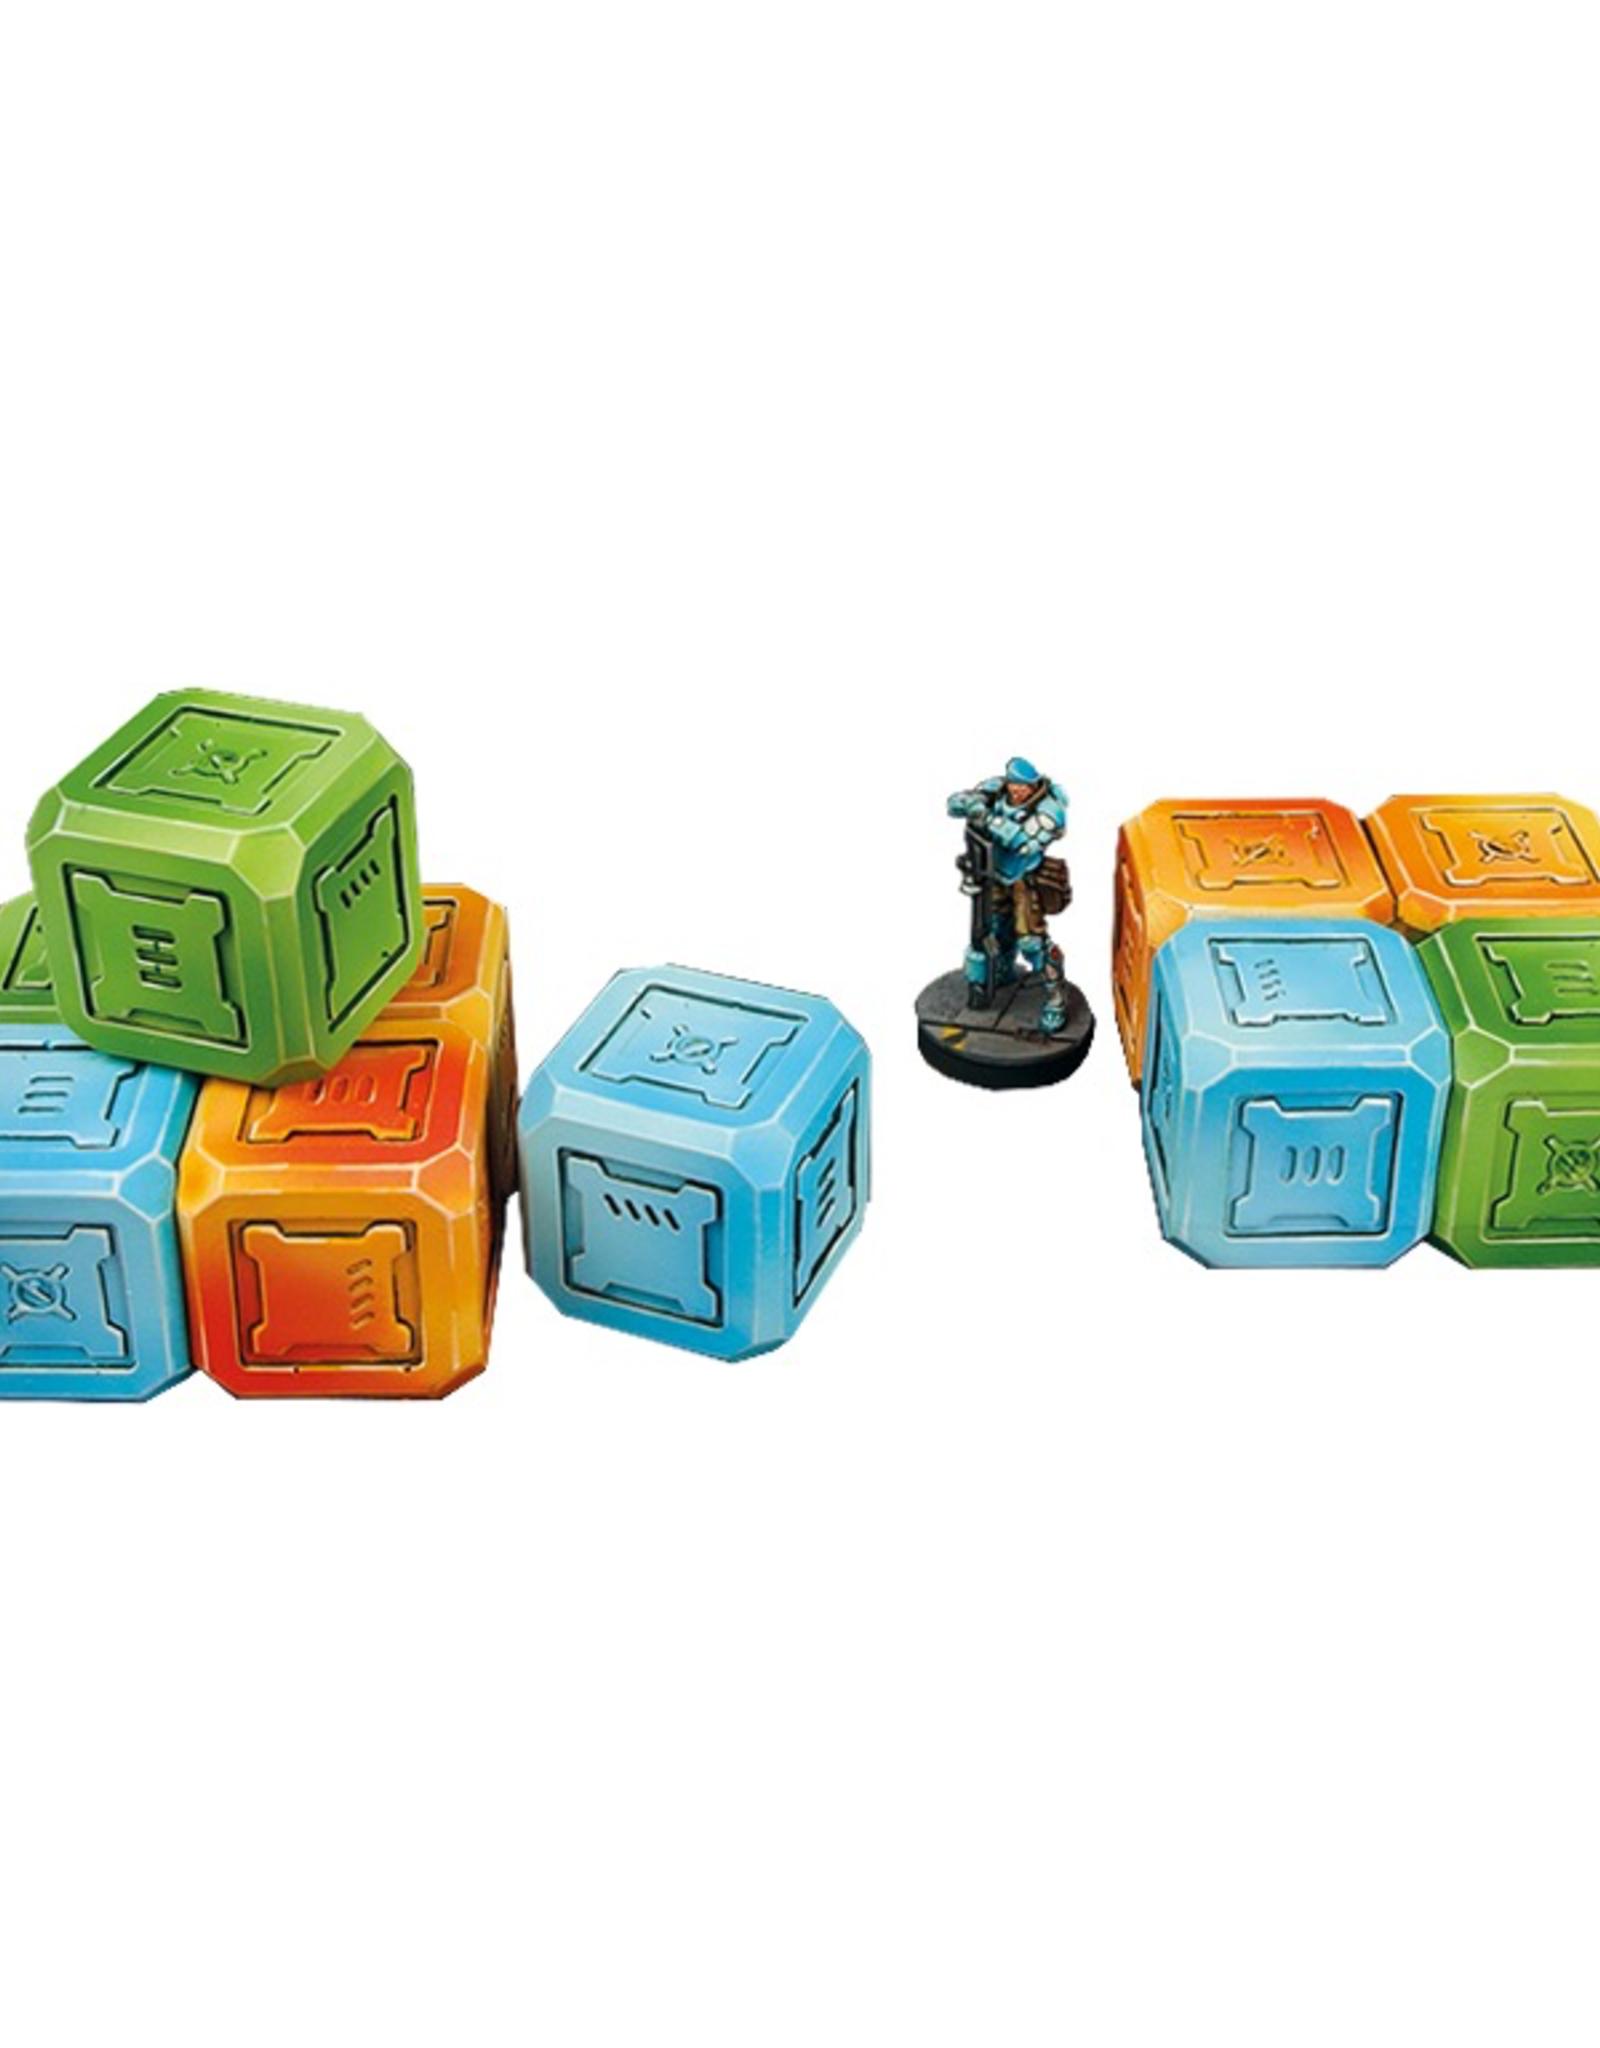 MicroArt - Scenery Quad Cargo Crates (4)